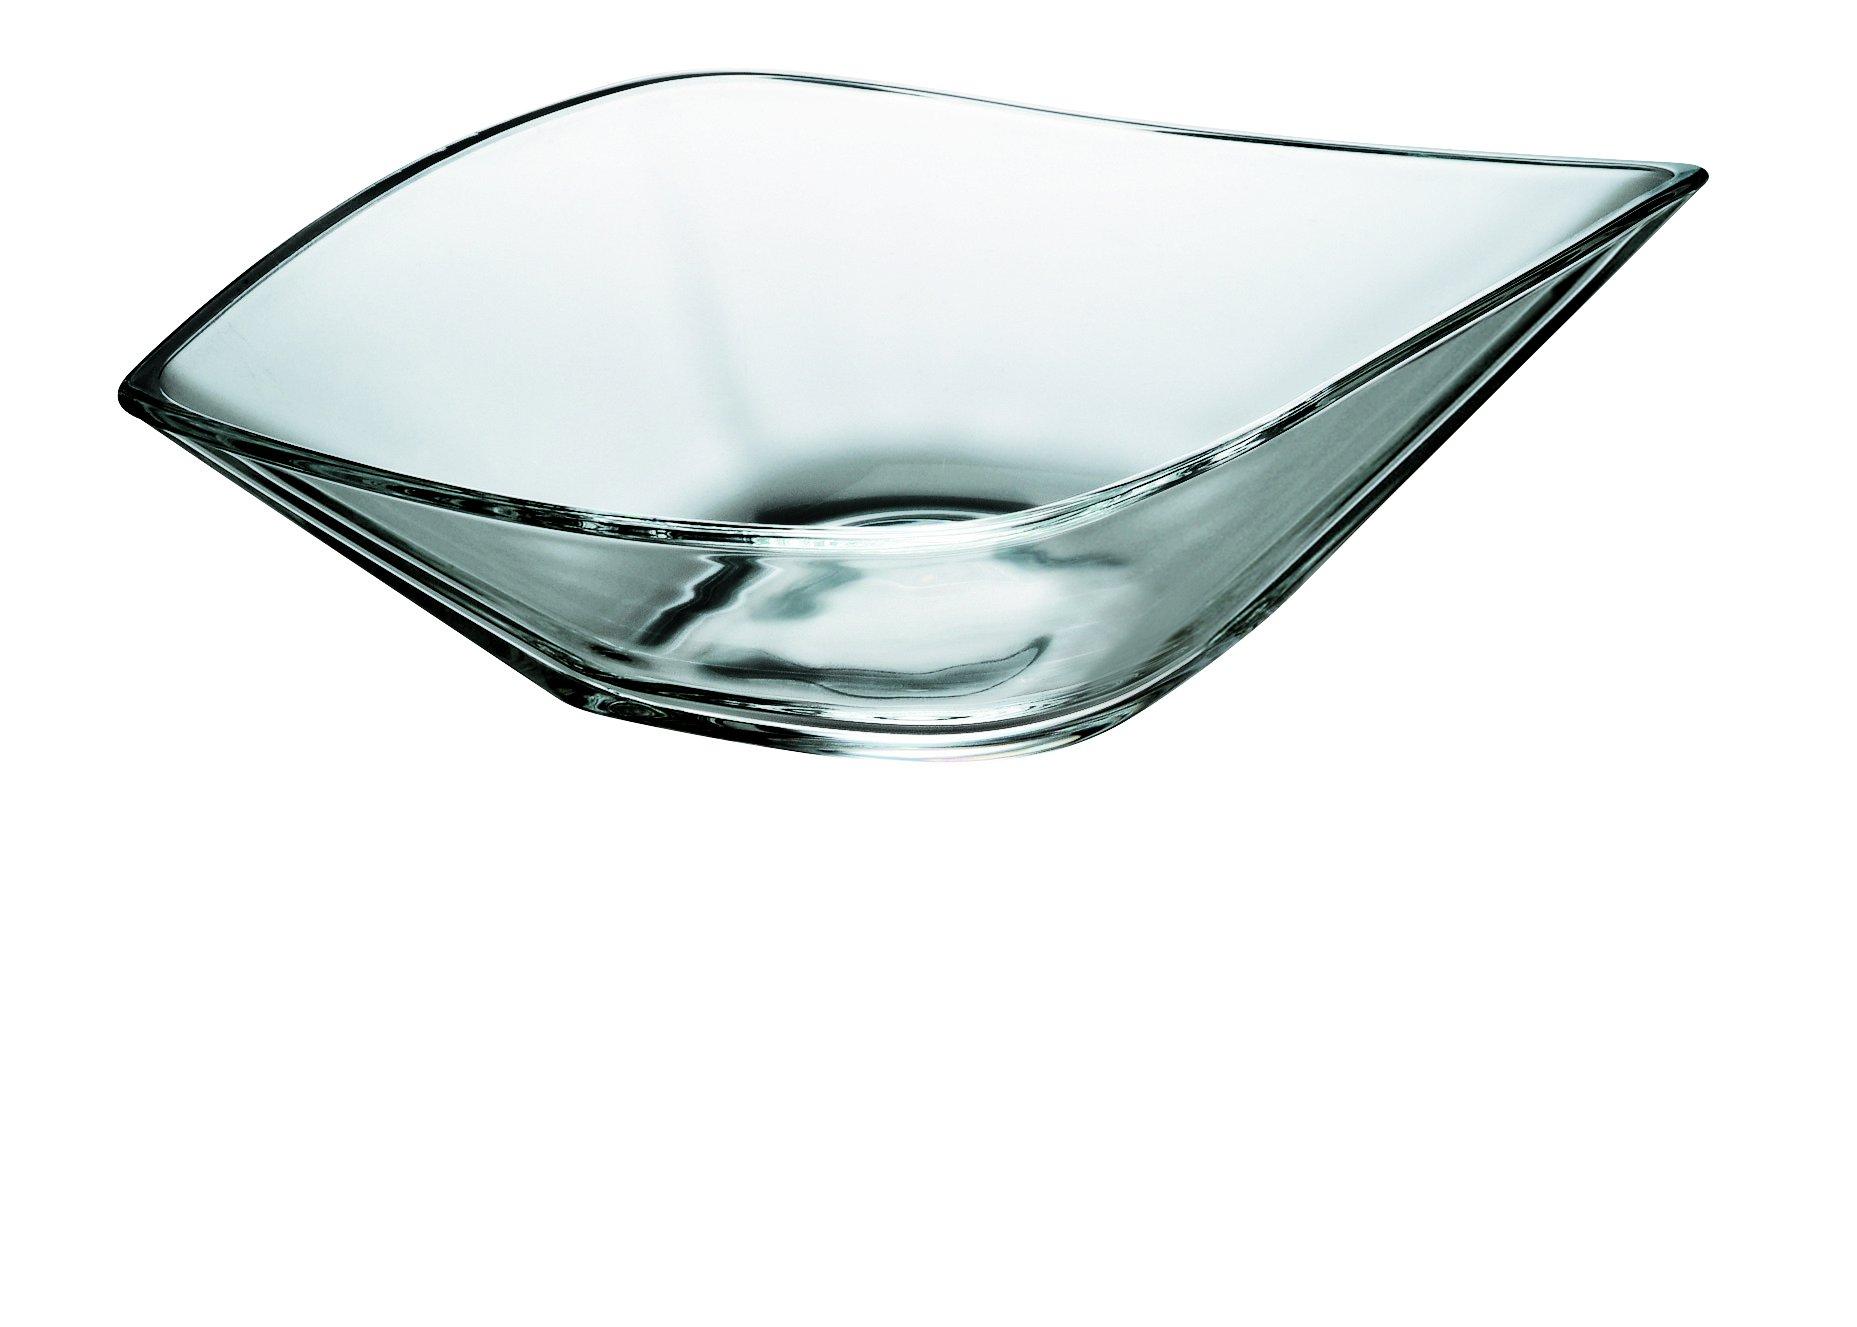 Barski - European Quality - Glass - Bowl - 14.7 '' L - Made in Europe